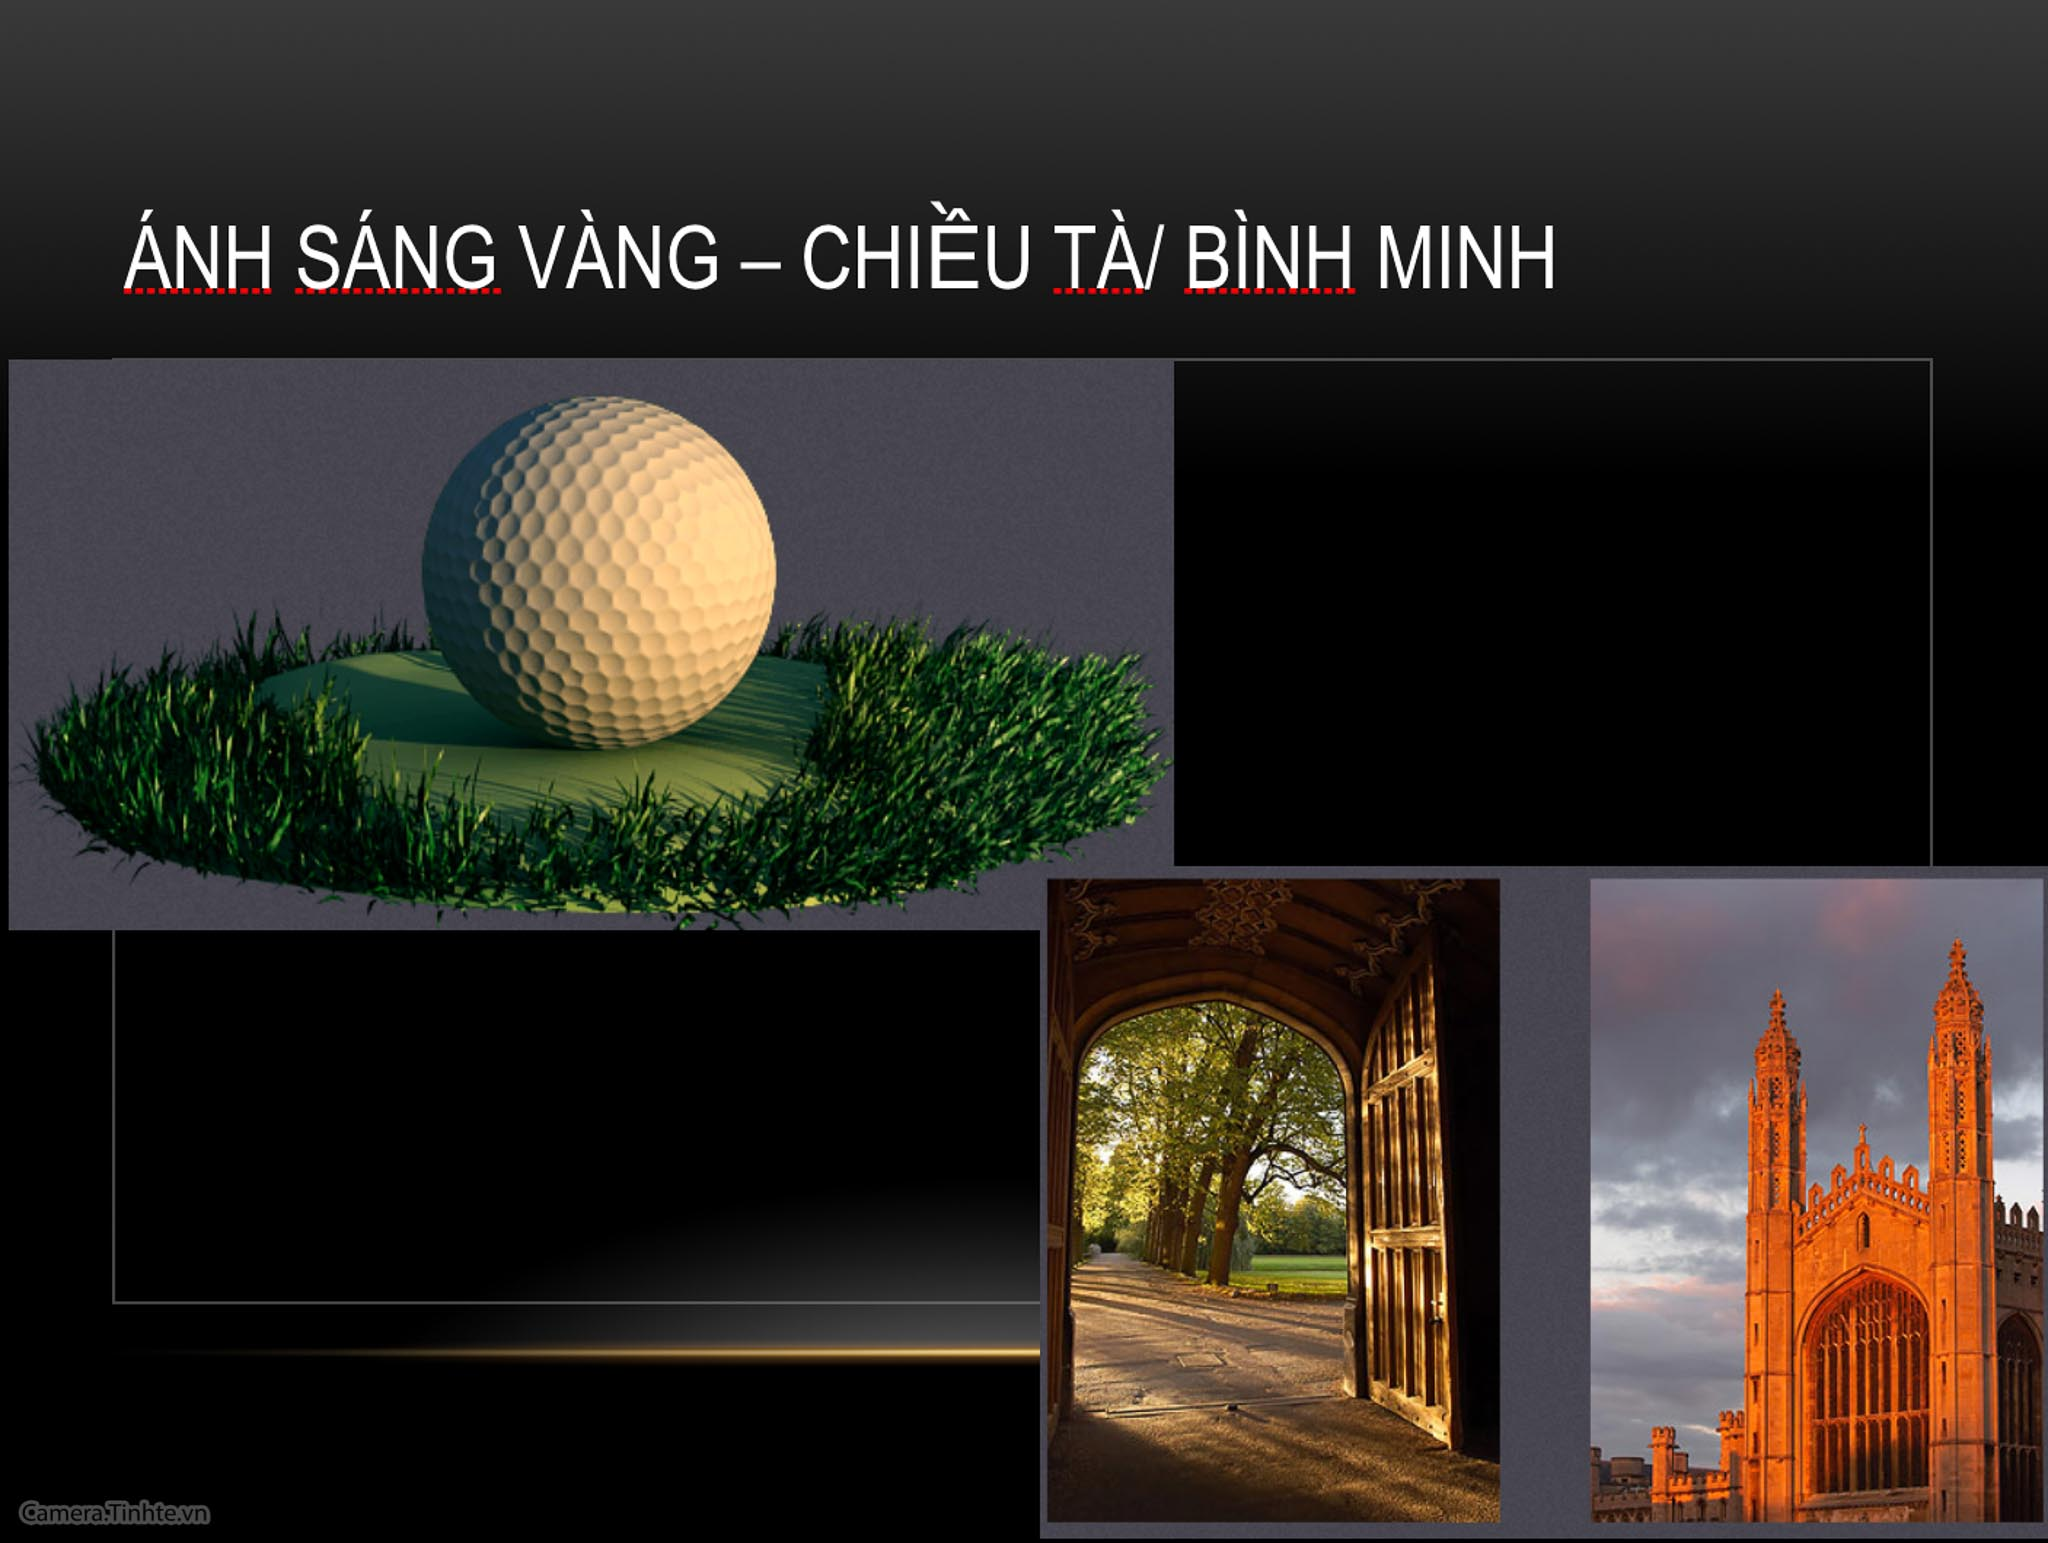 NACB 3 - Flash 1 - Camera.tinhte.vn-5.jpg